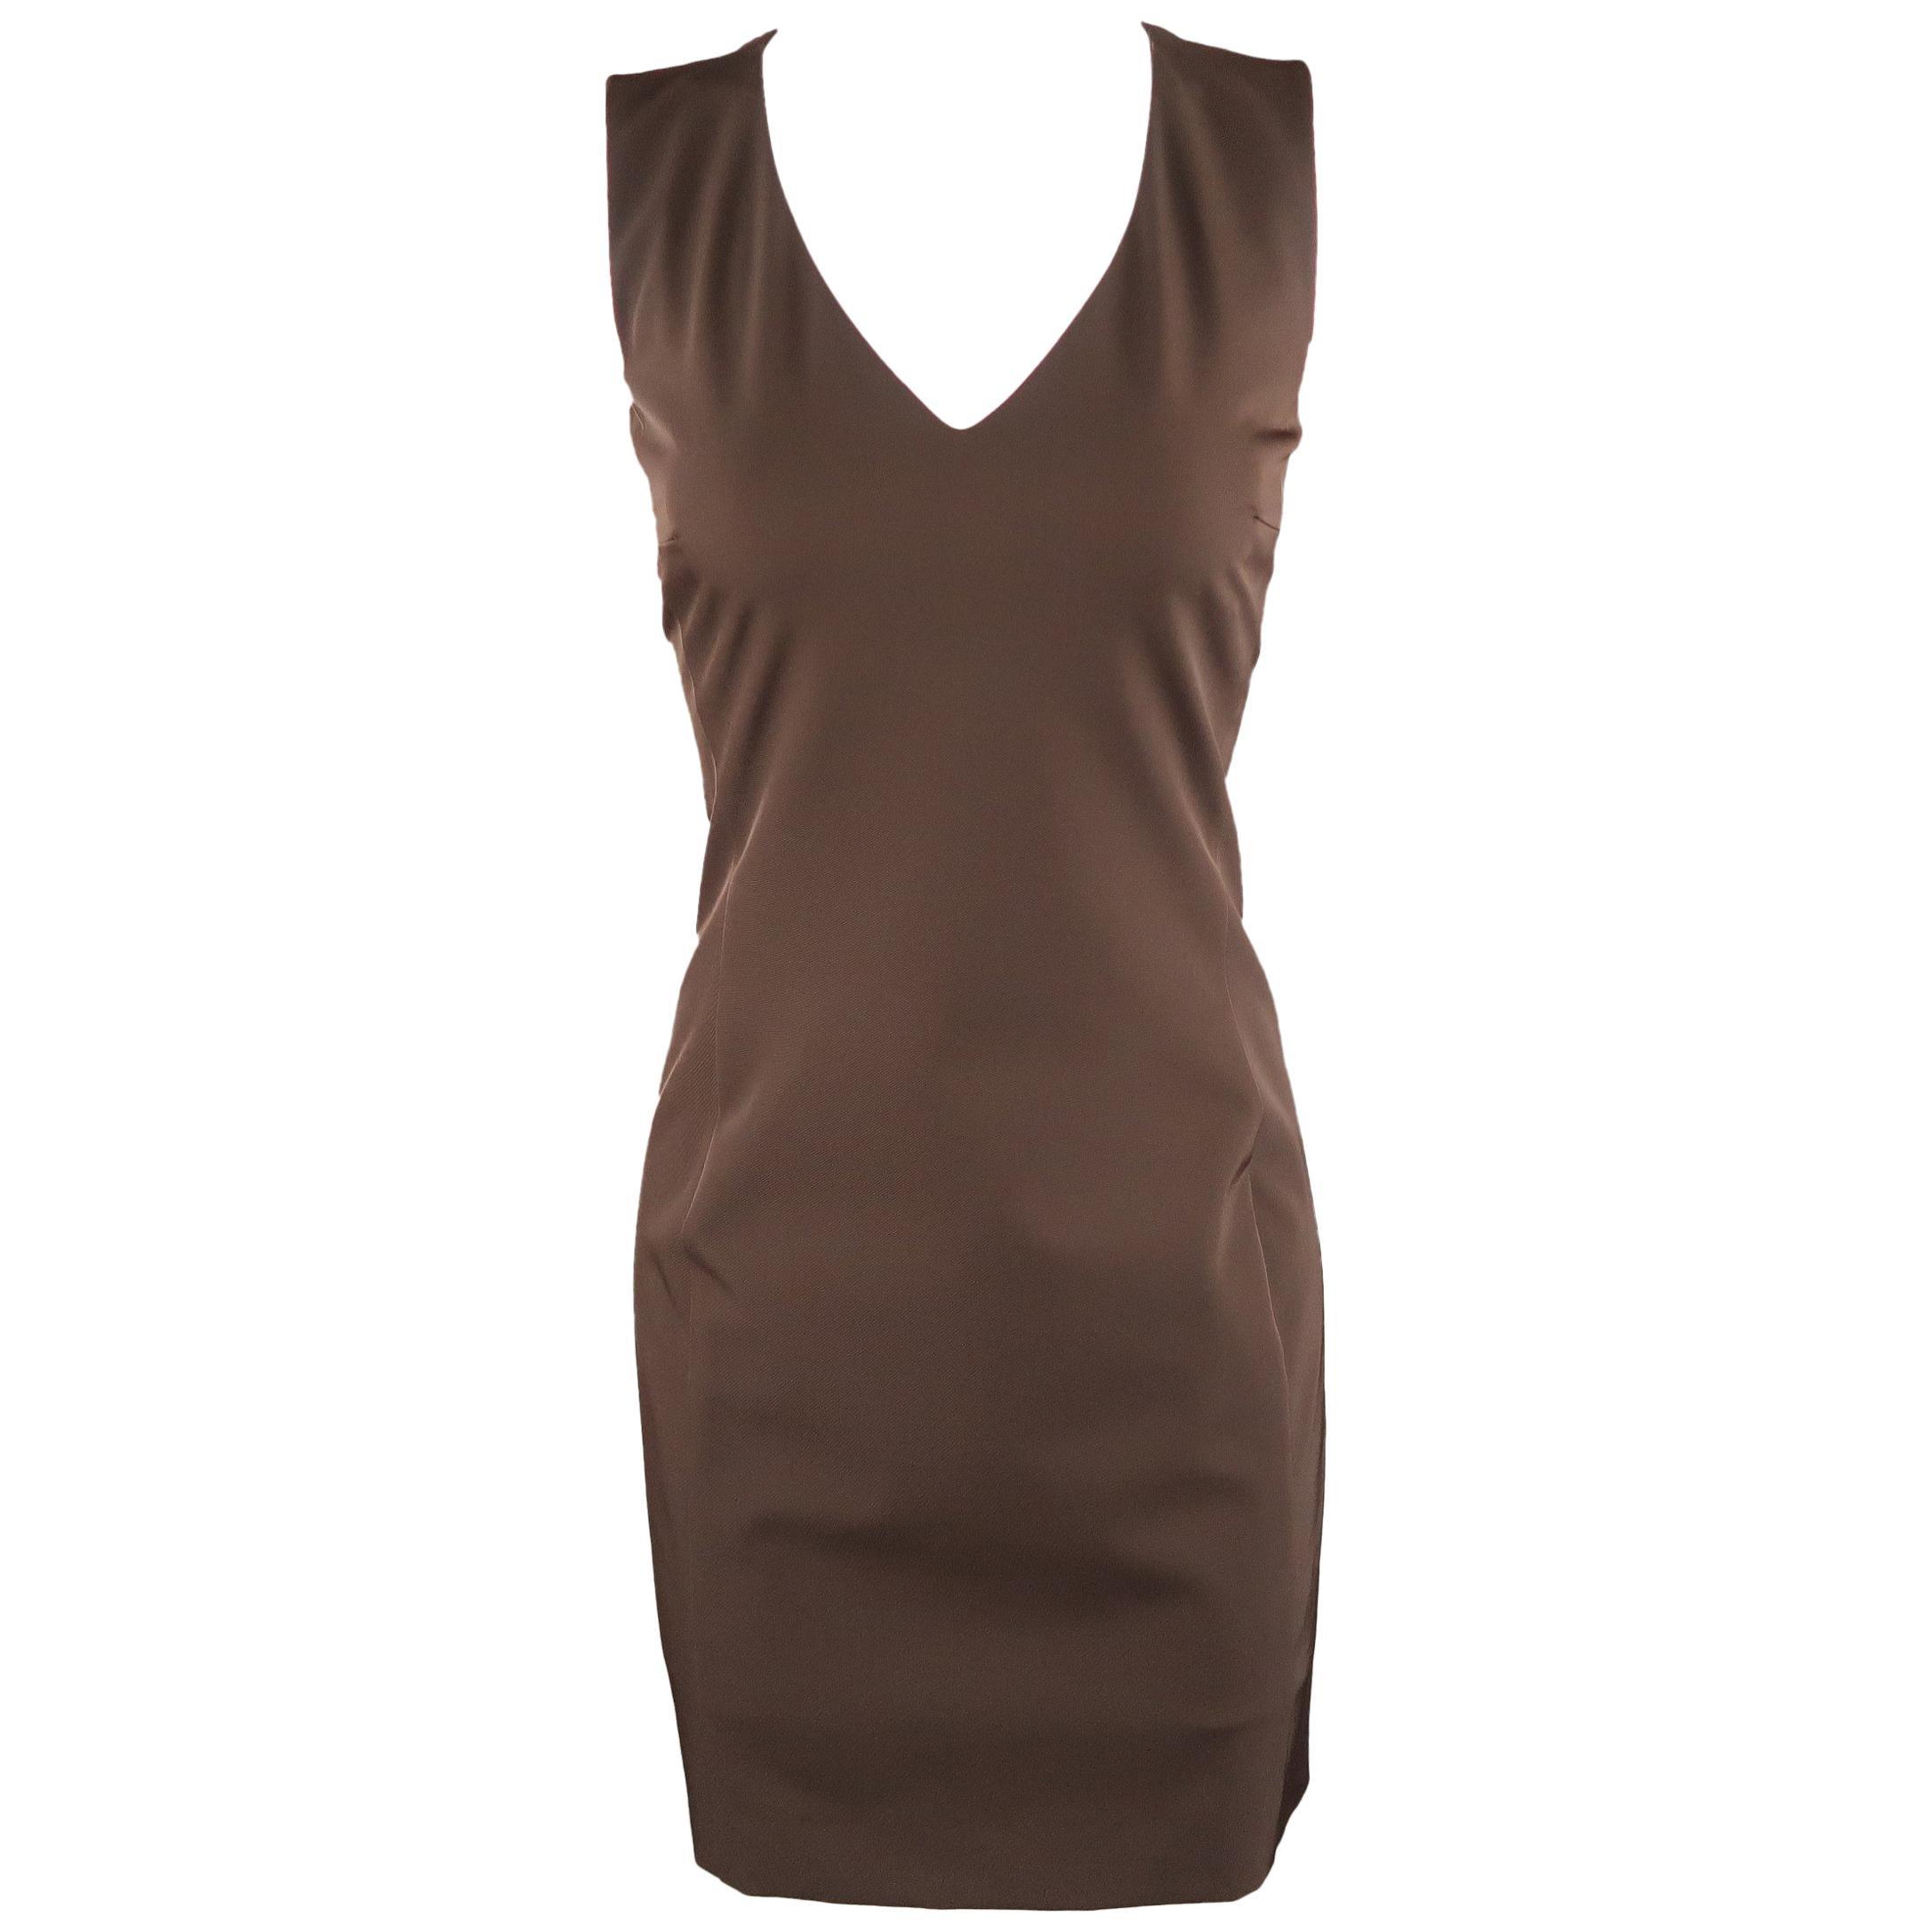 PRADA Size 4 Brown Twill V Neck Sleeveless Shift Dress